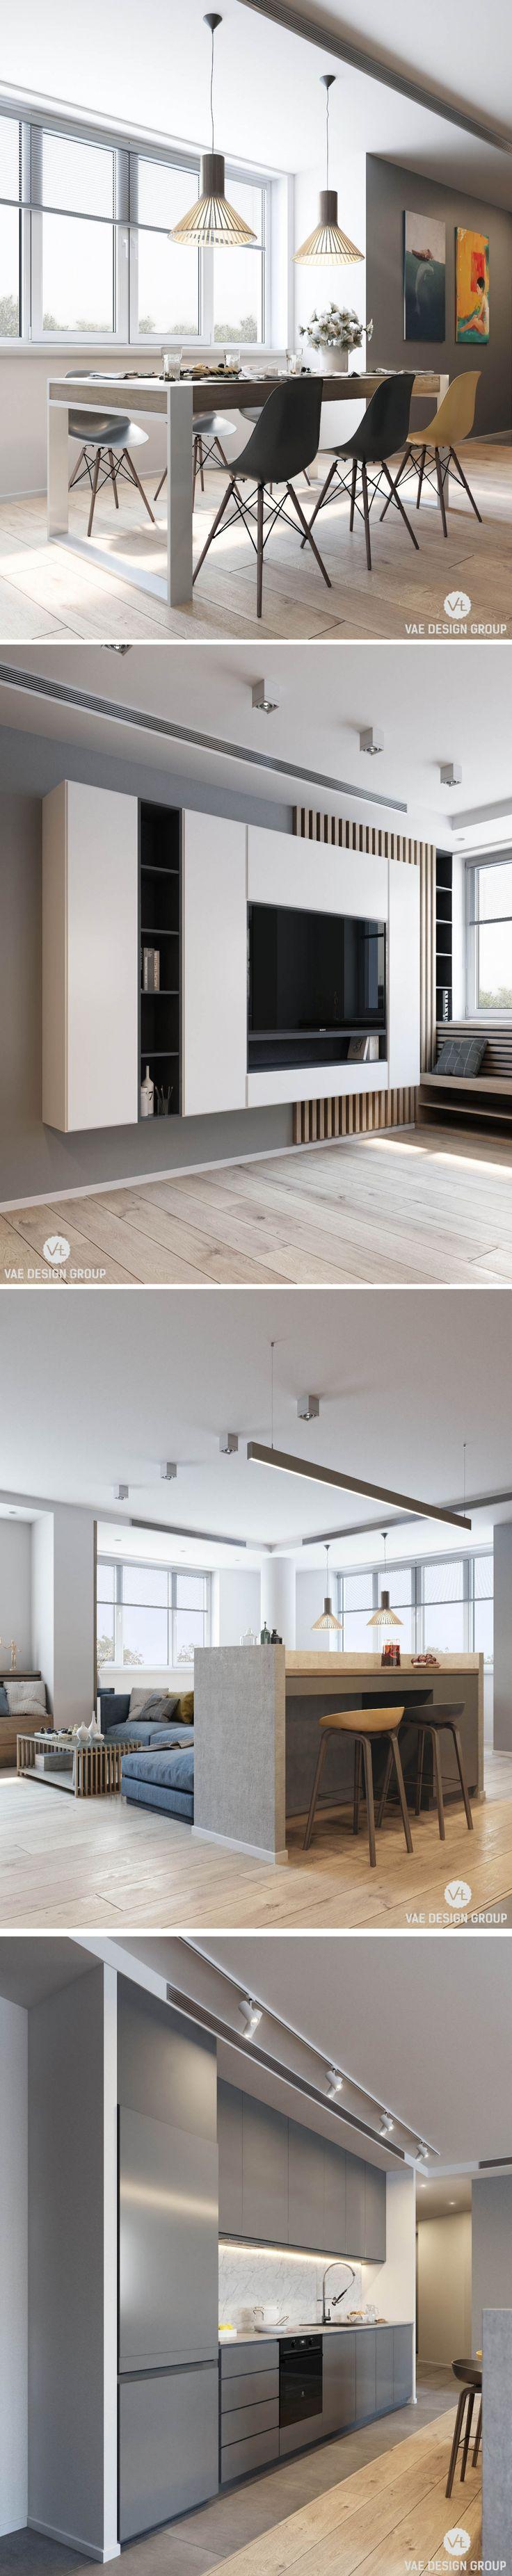 Living room - Галерея 3ddd.ru